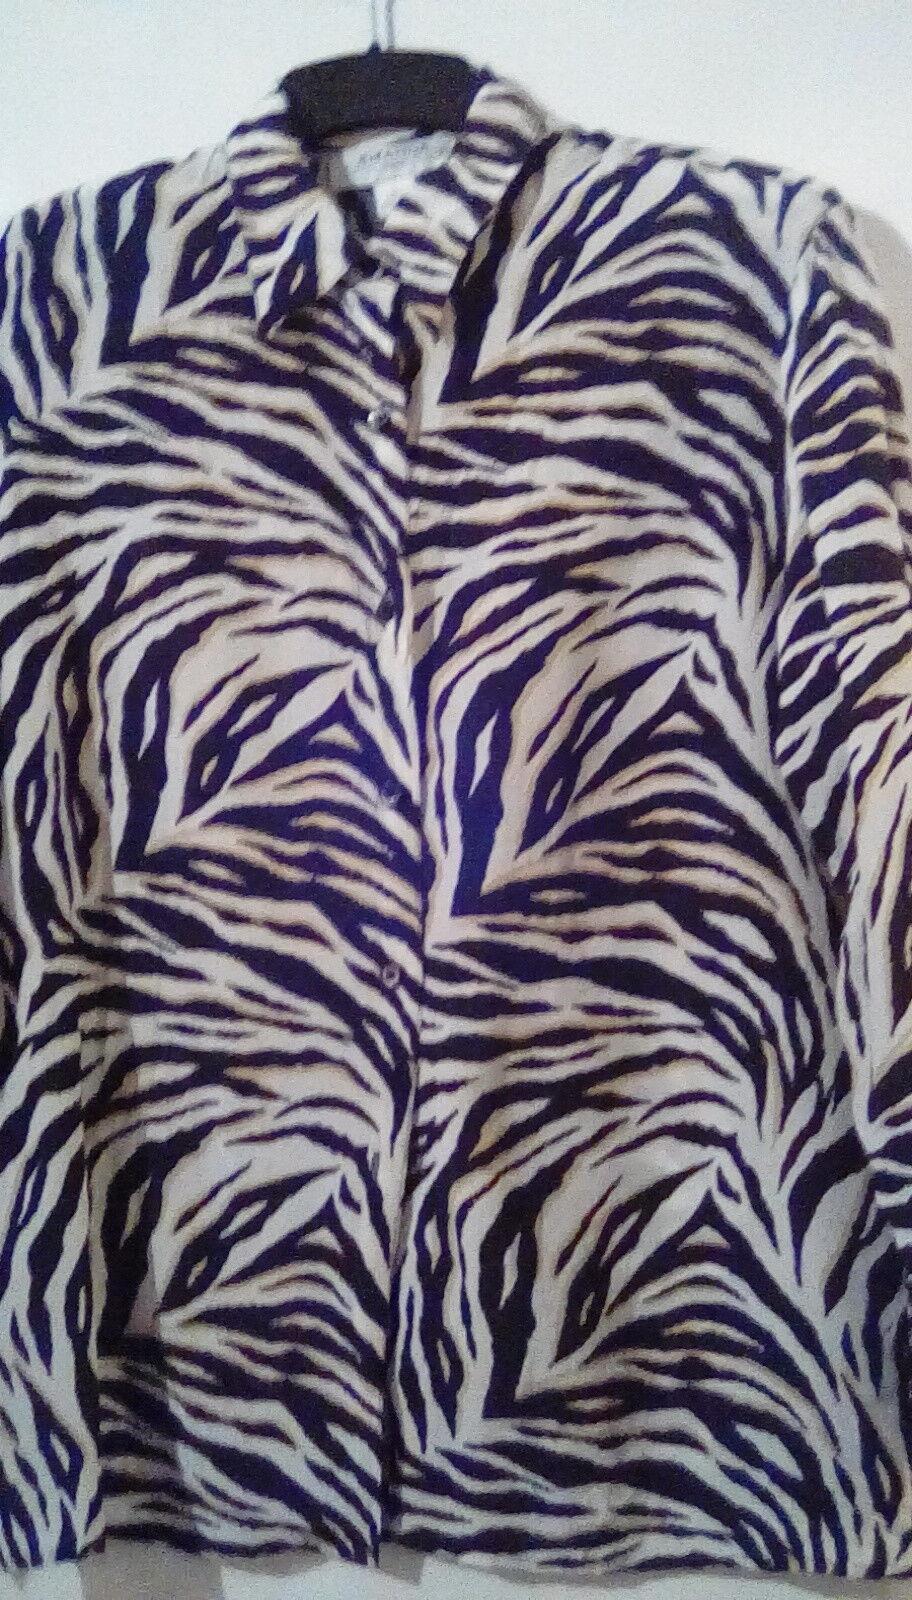 Pure Silk Amanda Cream schwarz Gelb Animal Print Classic Blouse szL. Stunning